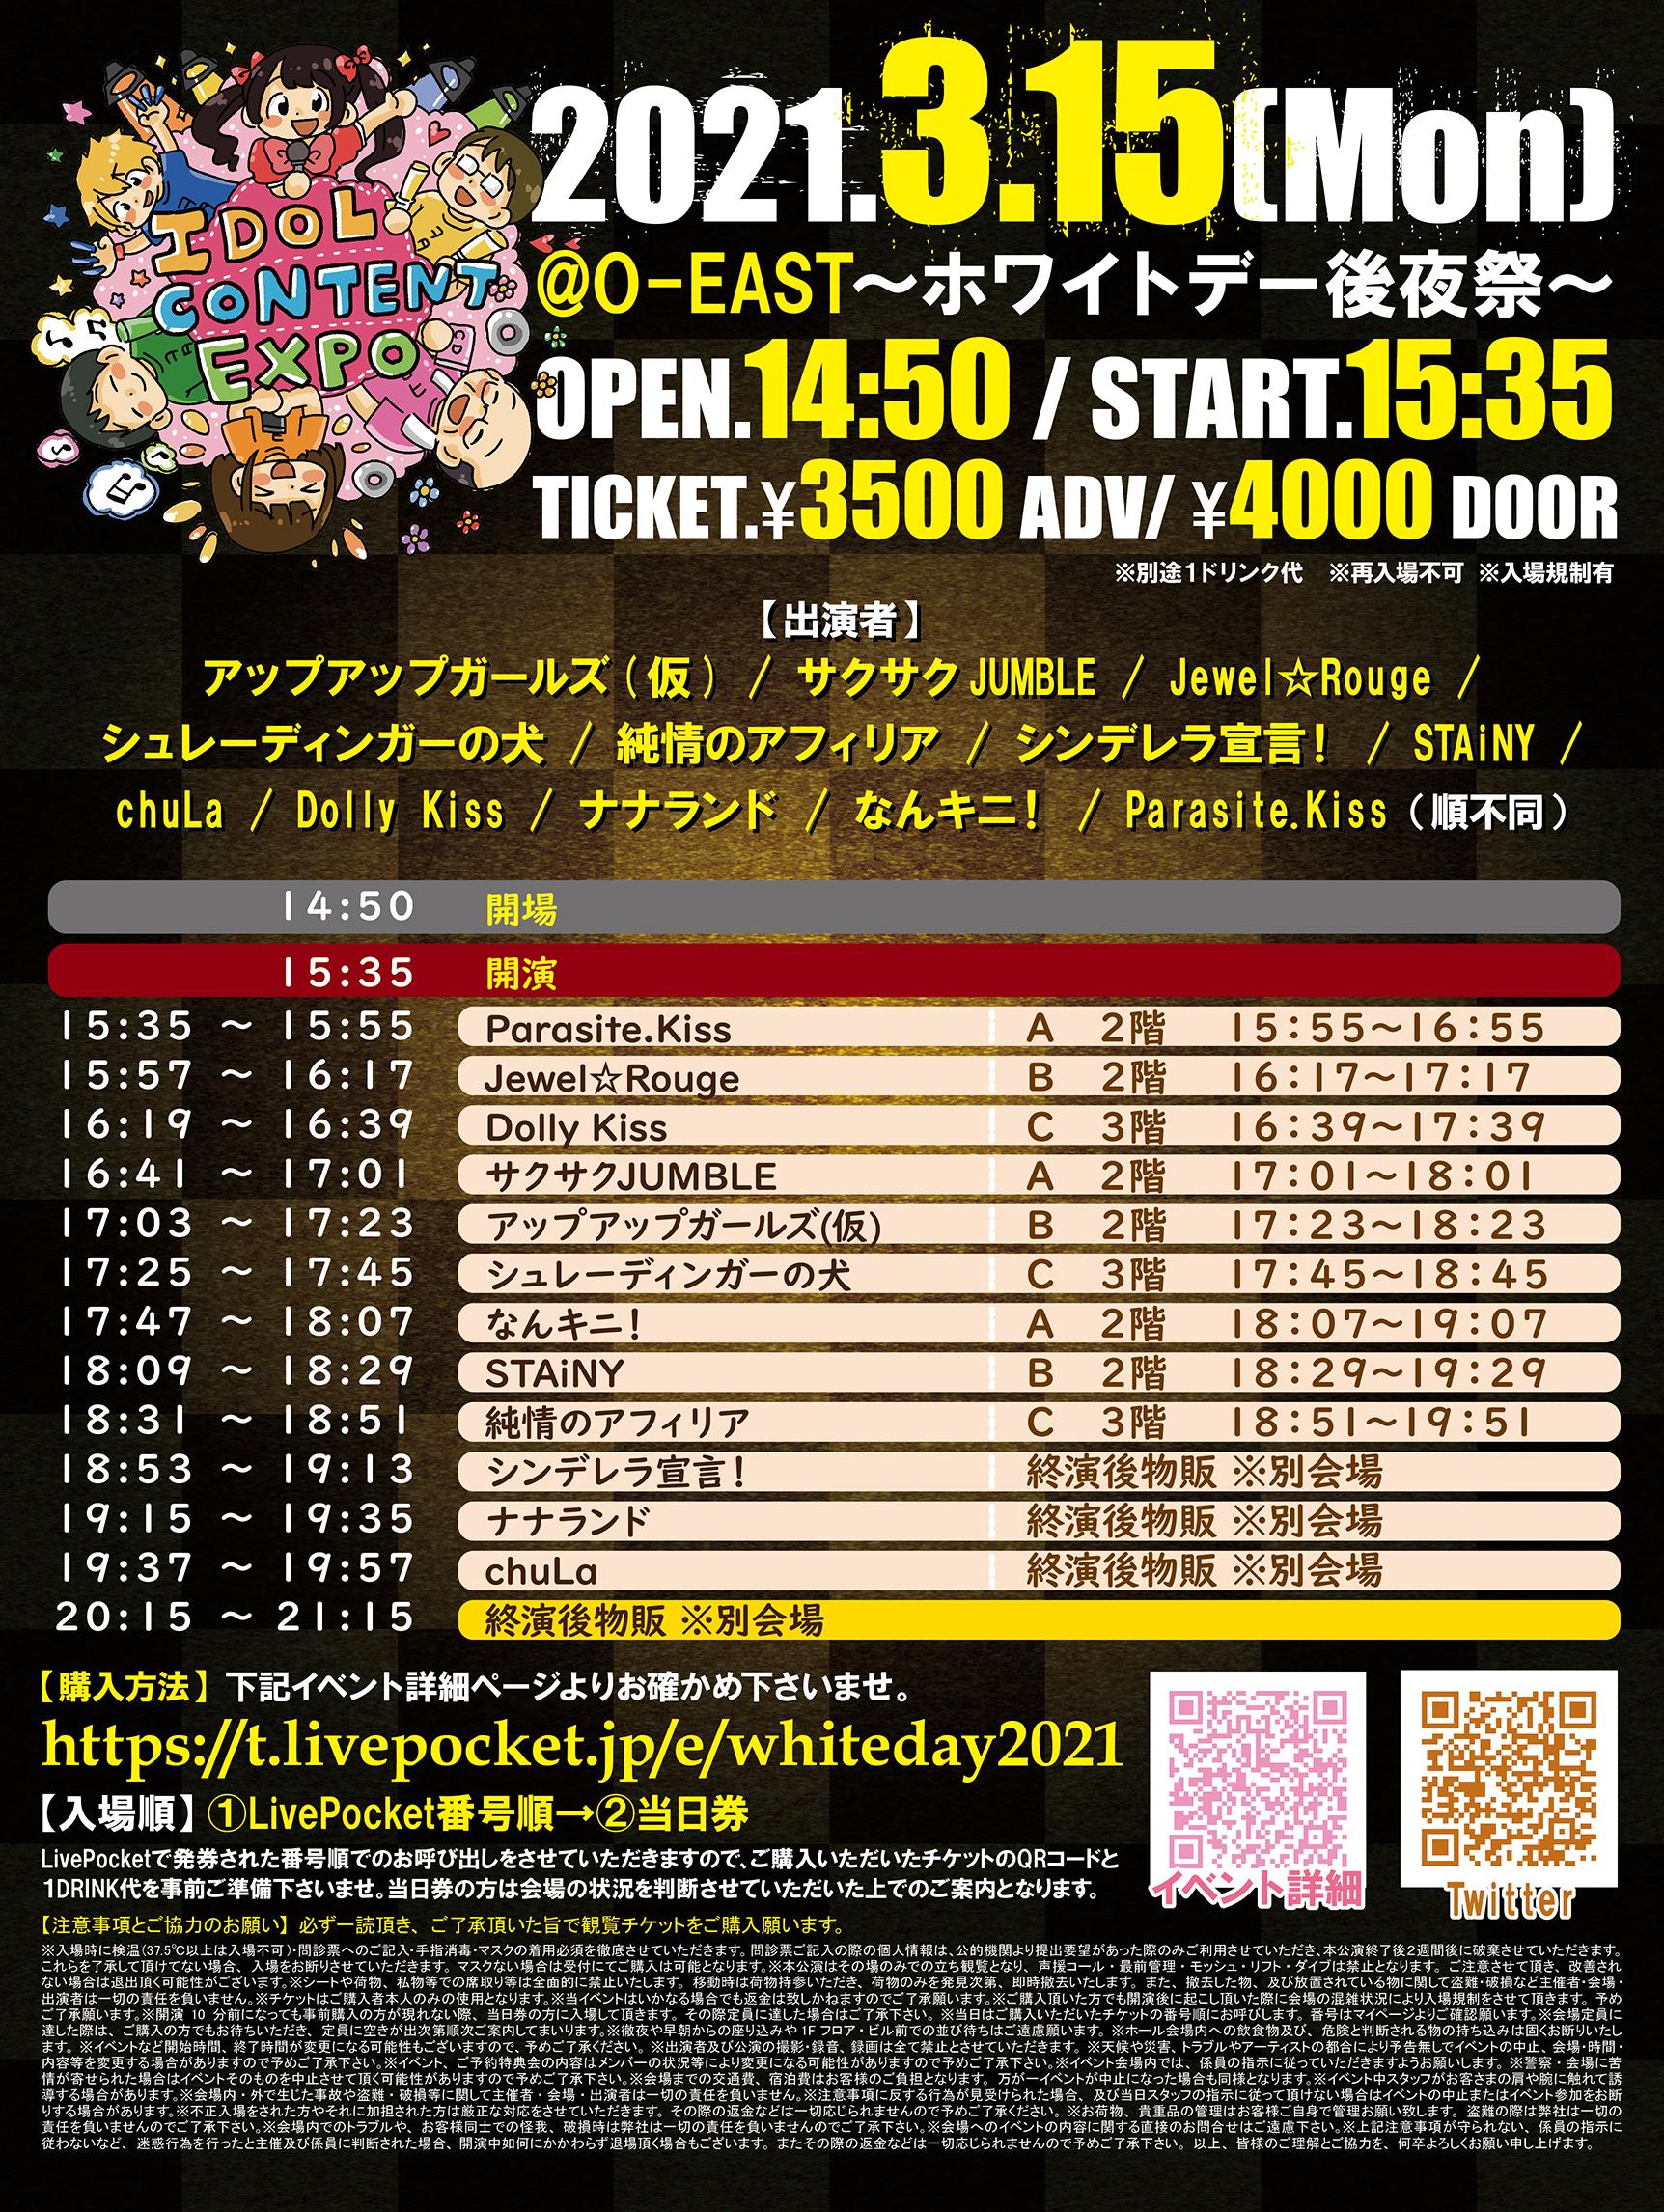 『 IDOL CONTENT EXPO @TSUTAYA O-EAST ~ホワイトデー後夜祭~ 』